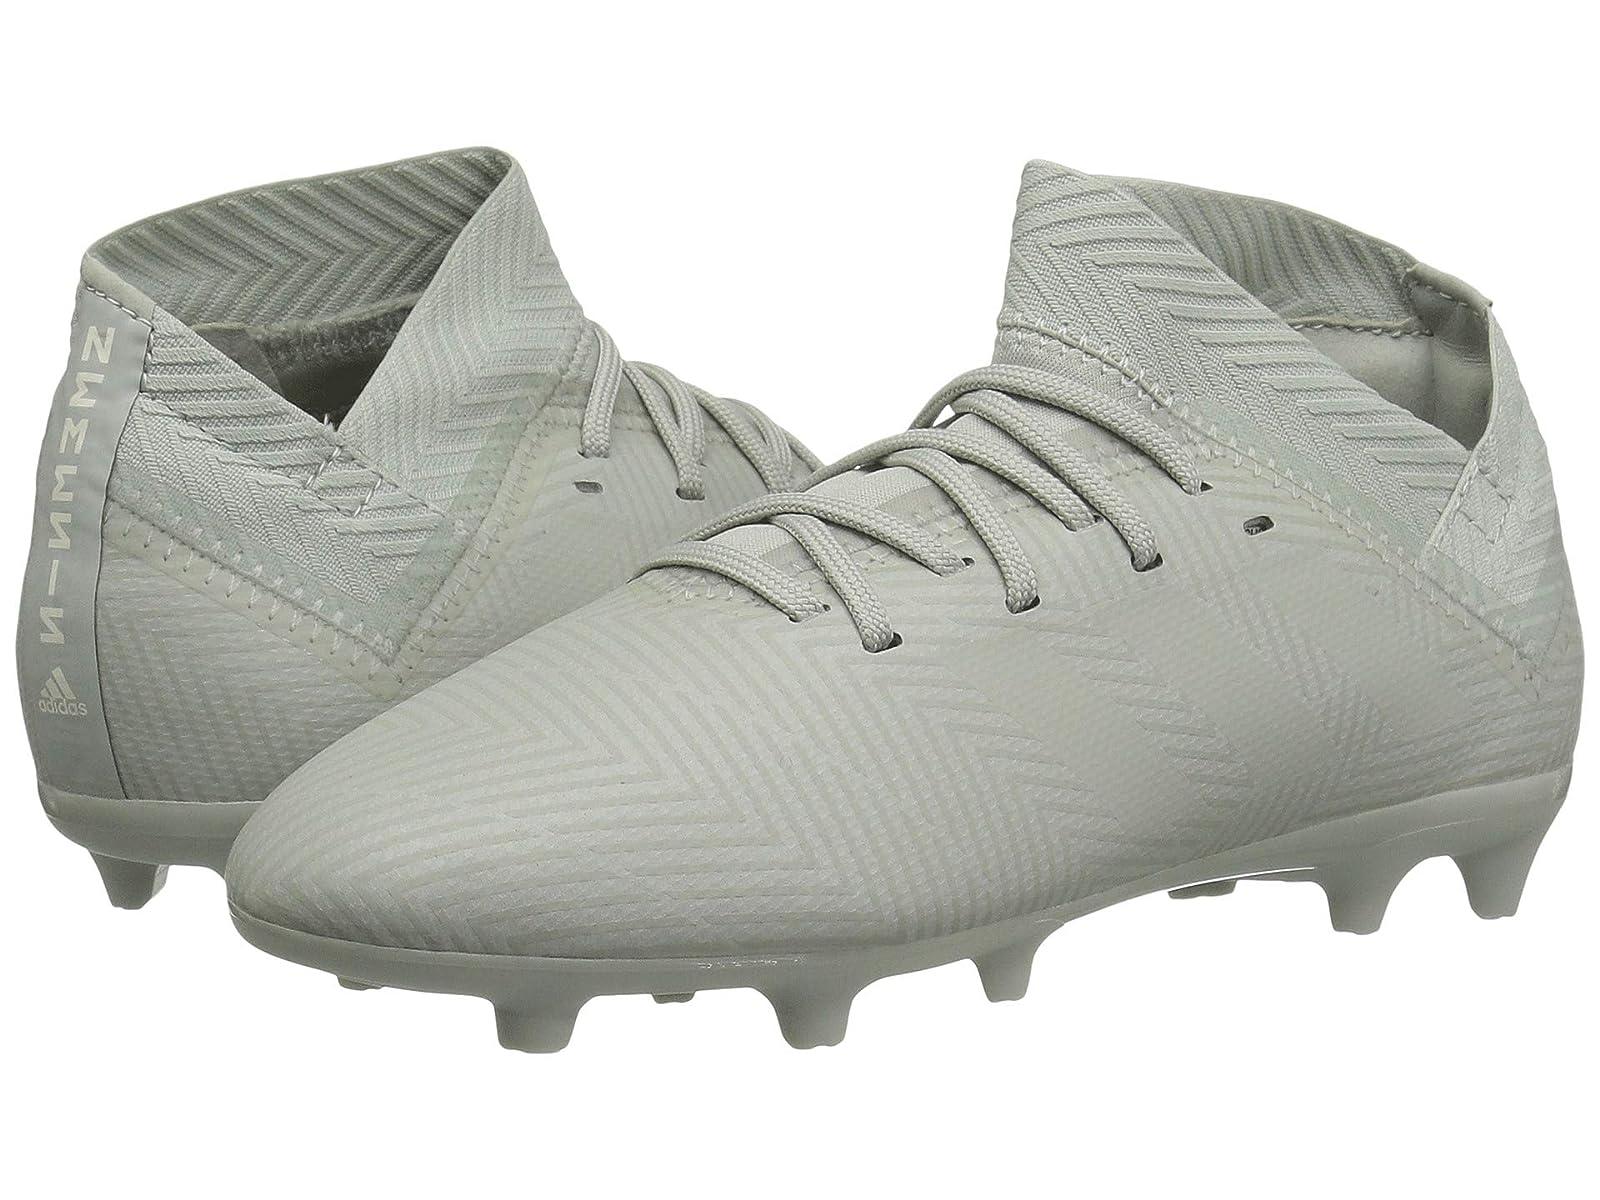 adidas Kids Nemeziz selection 18.3 FG Soccer (Little Kid/Big Kid)< selection Nemeziz material <Gentlemen/Ladies 7ae6c1